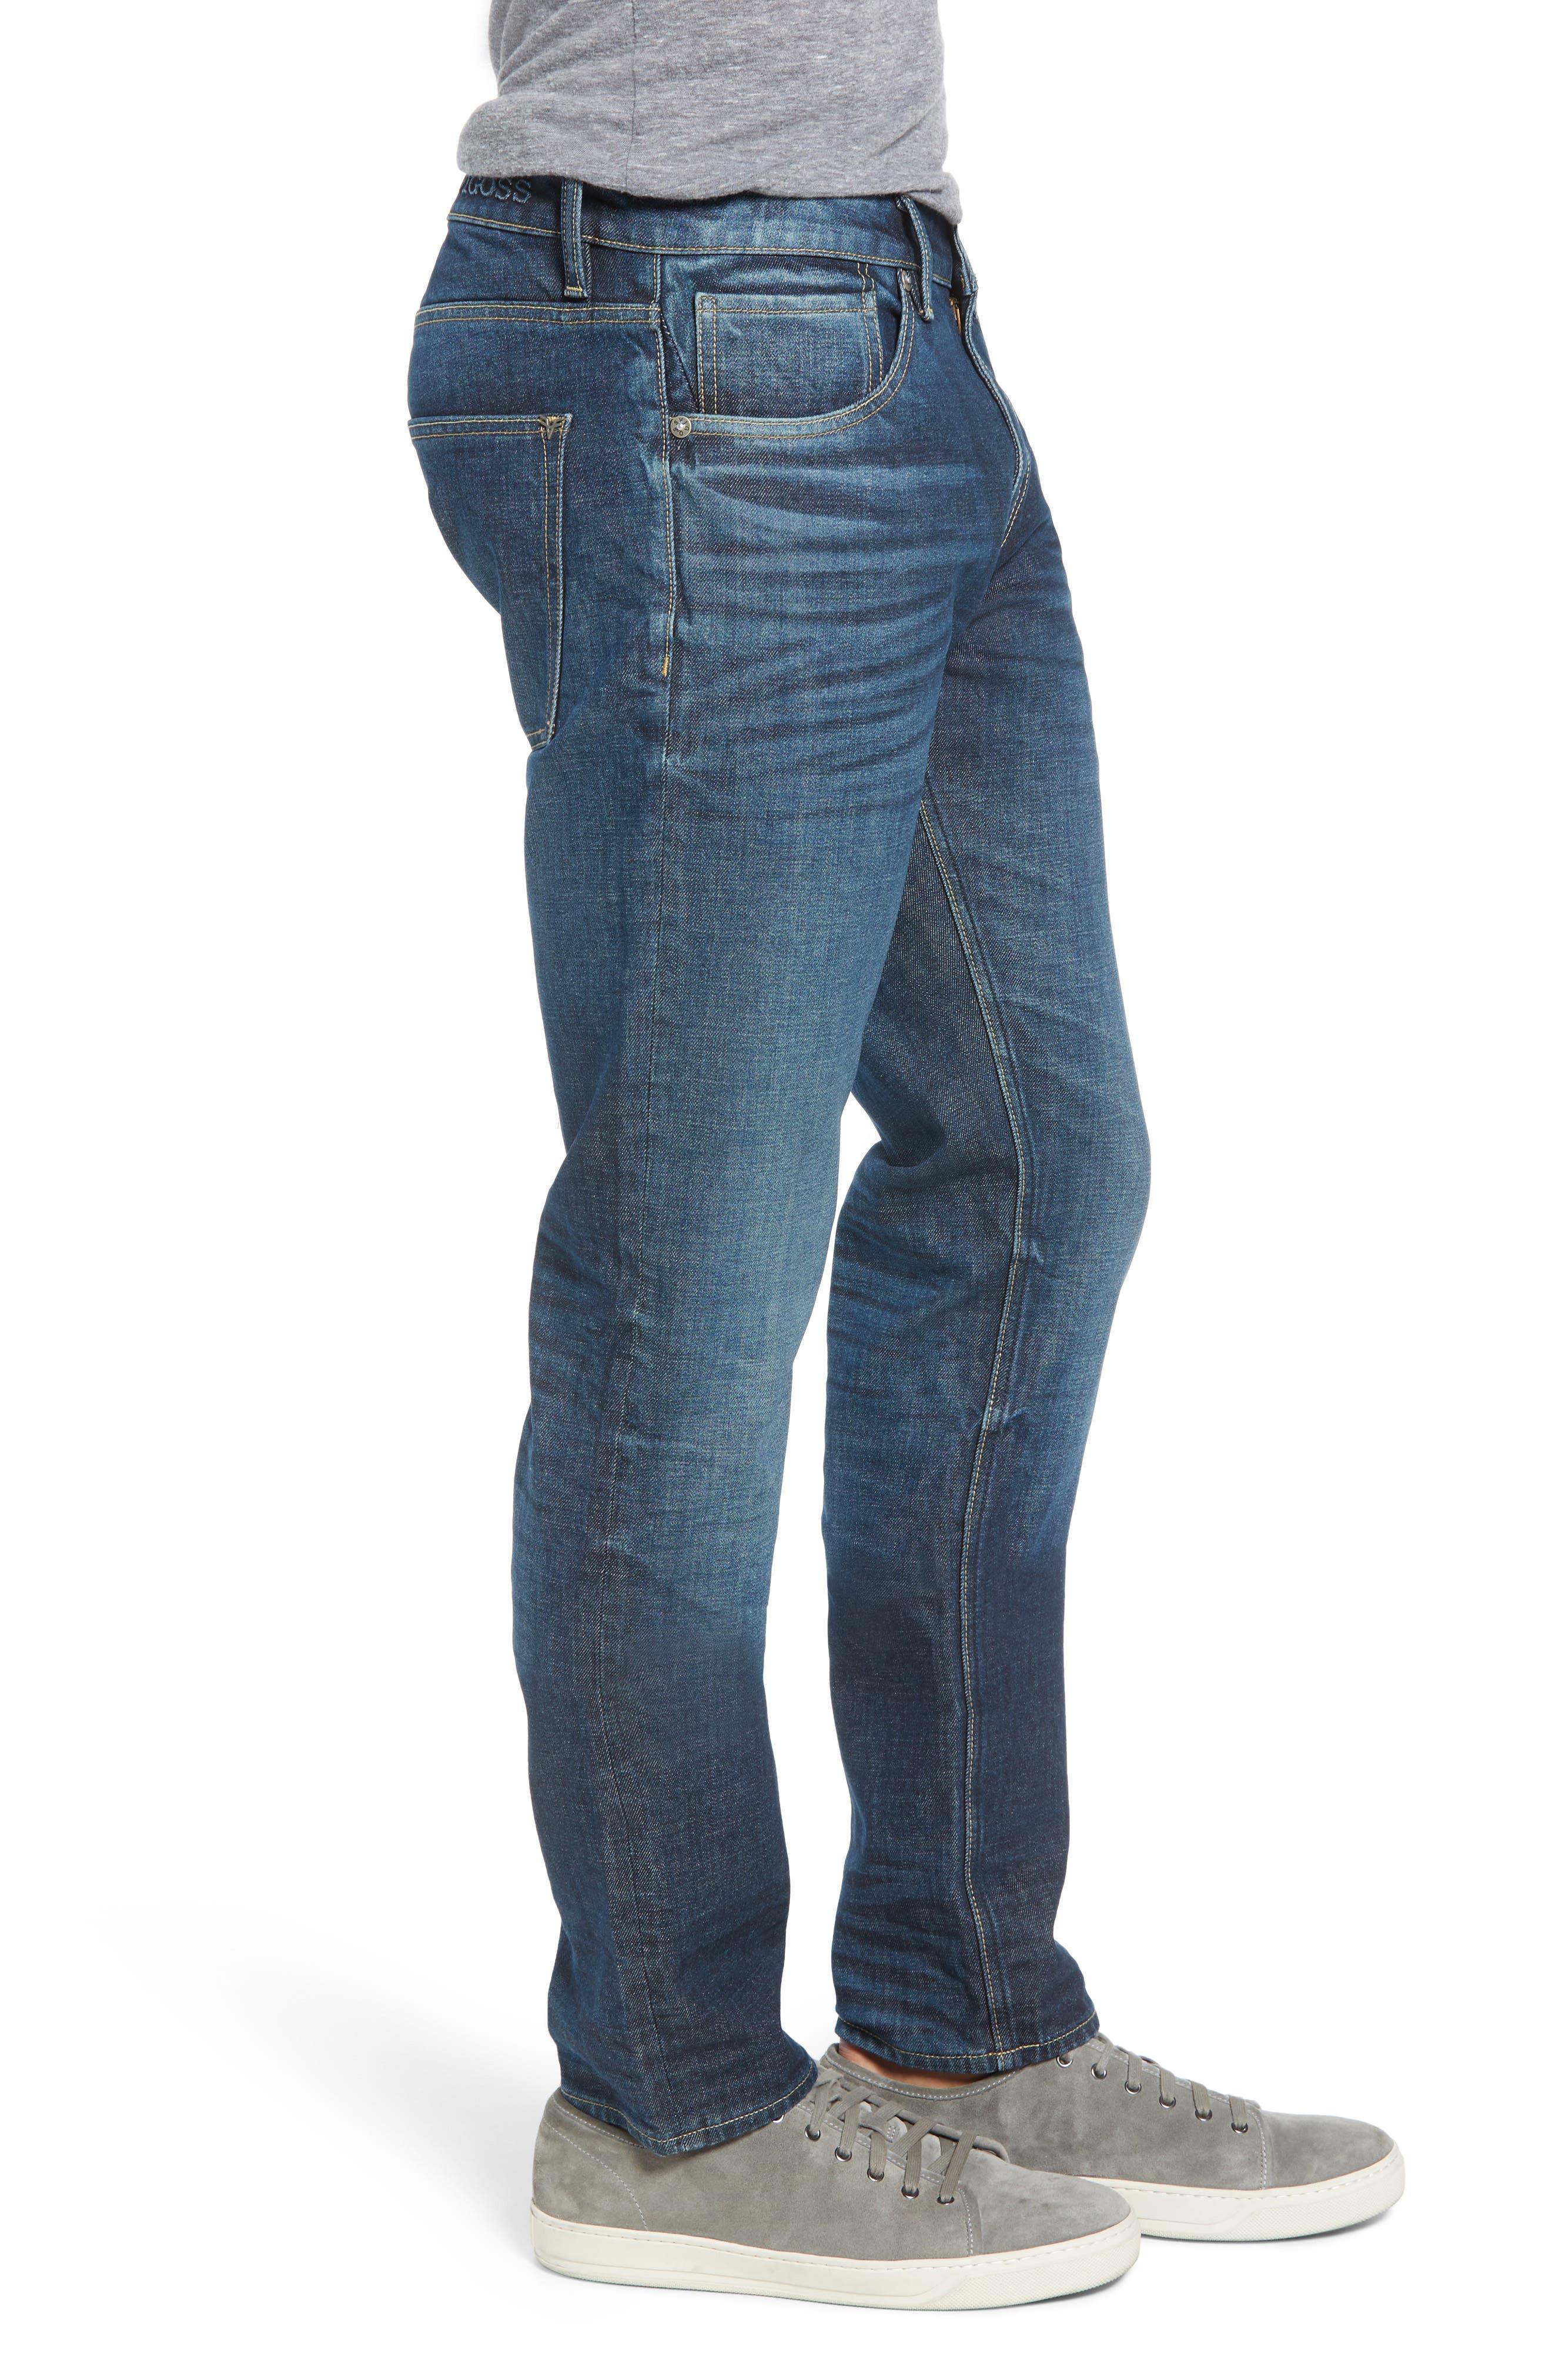 Mick Slim Fit Jeans,                             Alternate thumbnail 3, color,                             DARK 3D WASH